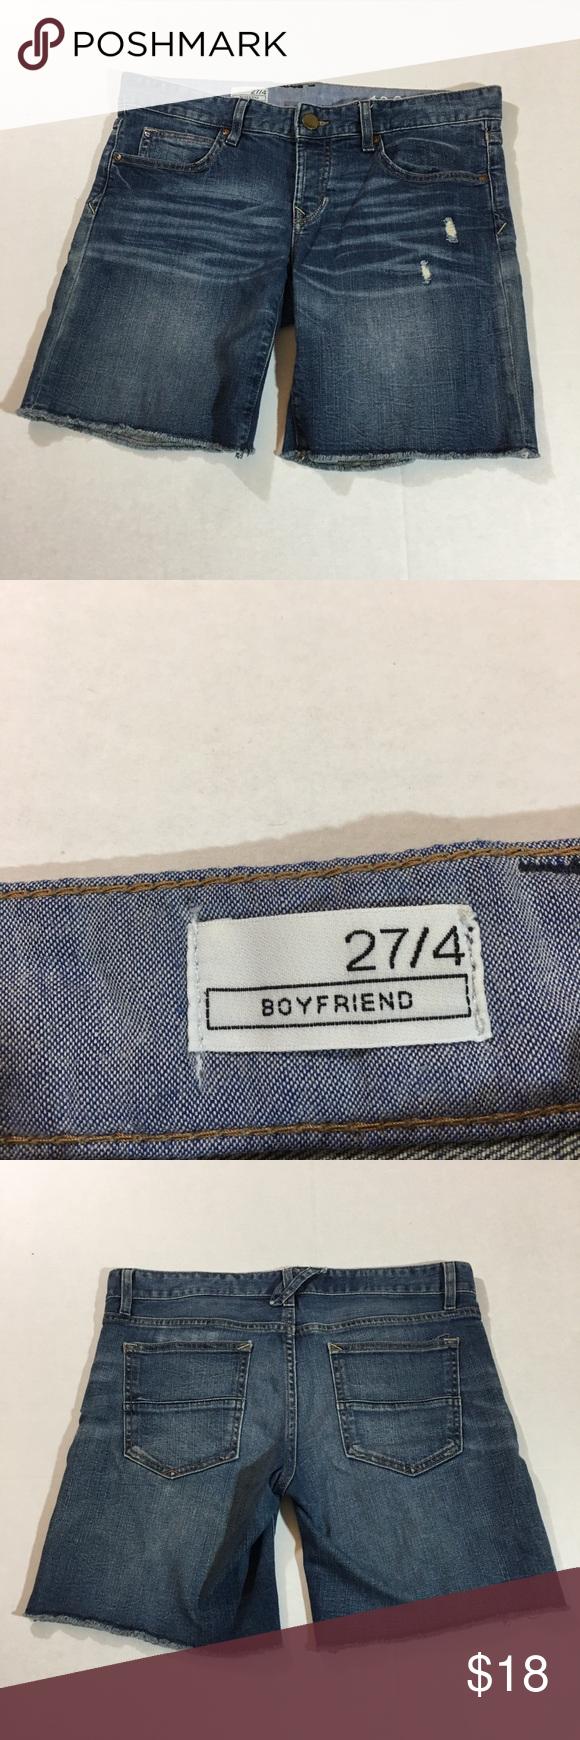 "dbb382bb5161 Gap boyfriend denim jean shorts Women's gap boyfriend jean shorts. Size 27/4.  Approx measurements laying flat: Waist 16.5"" Rise 8"" Inseam 7.5"" Gently  used."